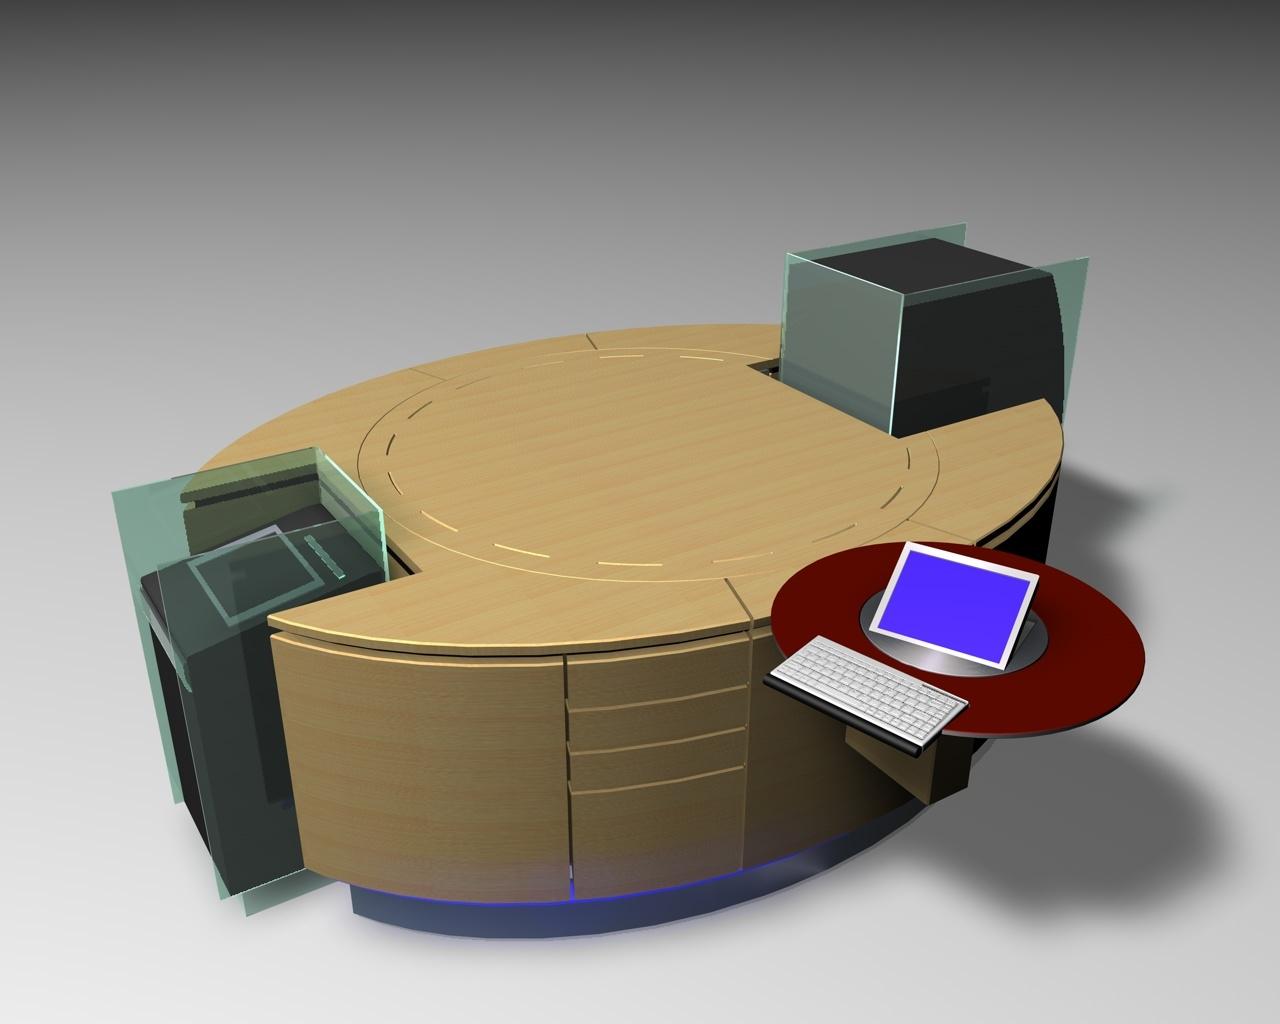 produktdesign-sb-insel-08